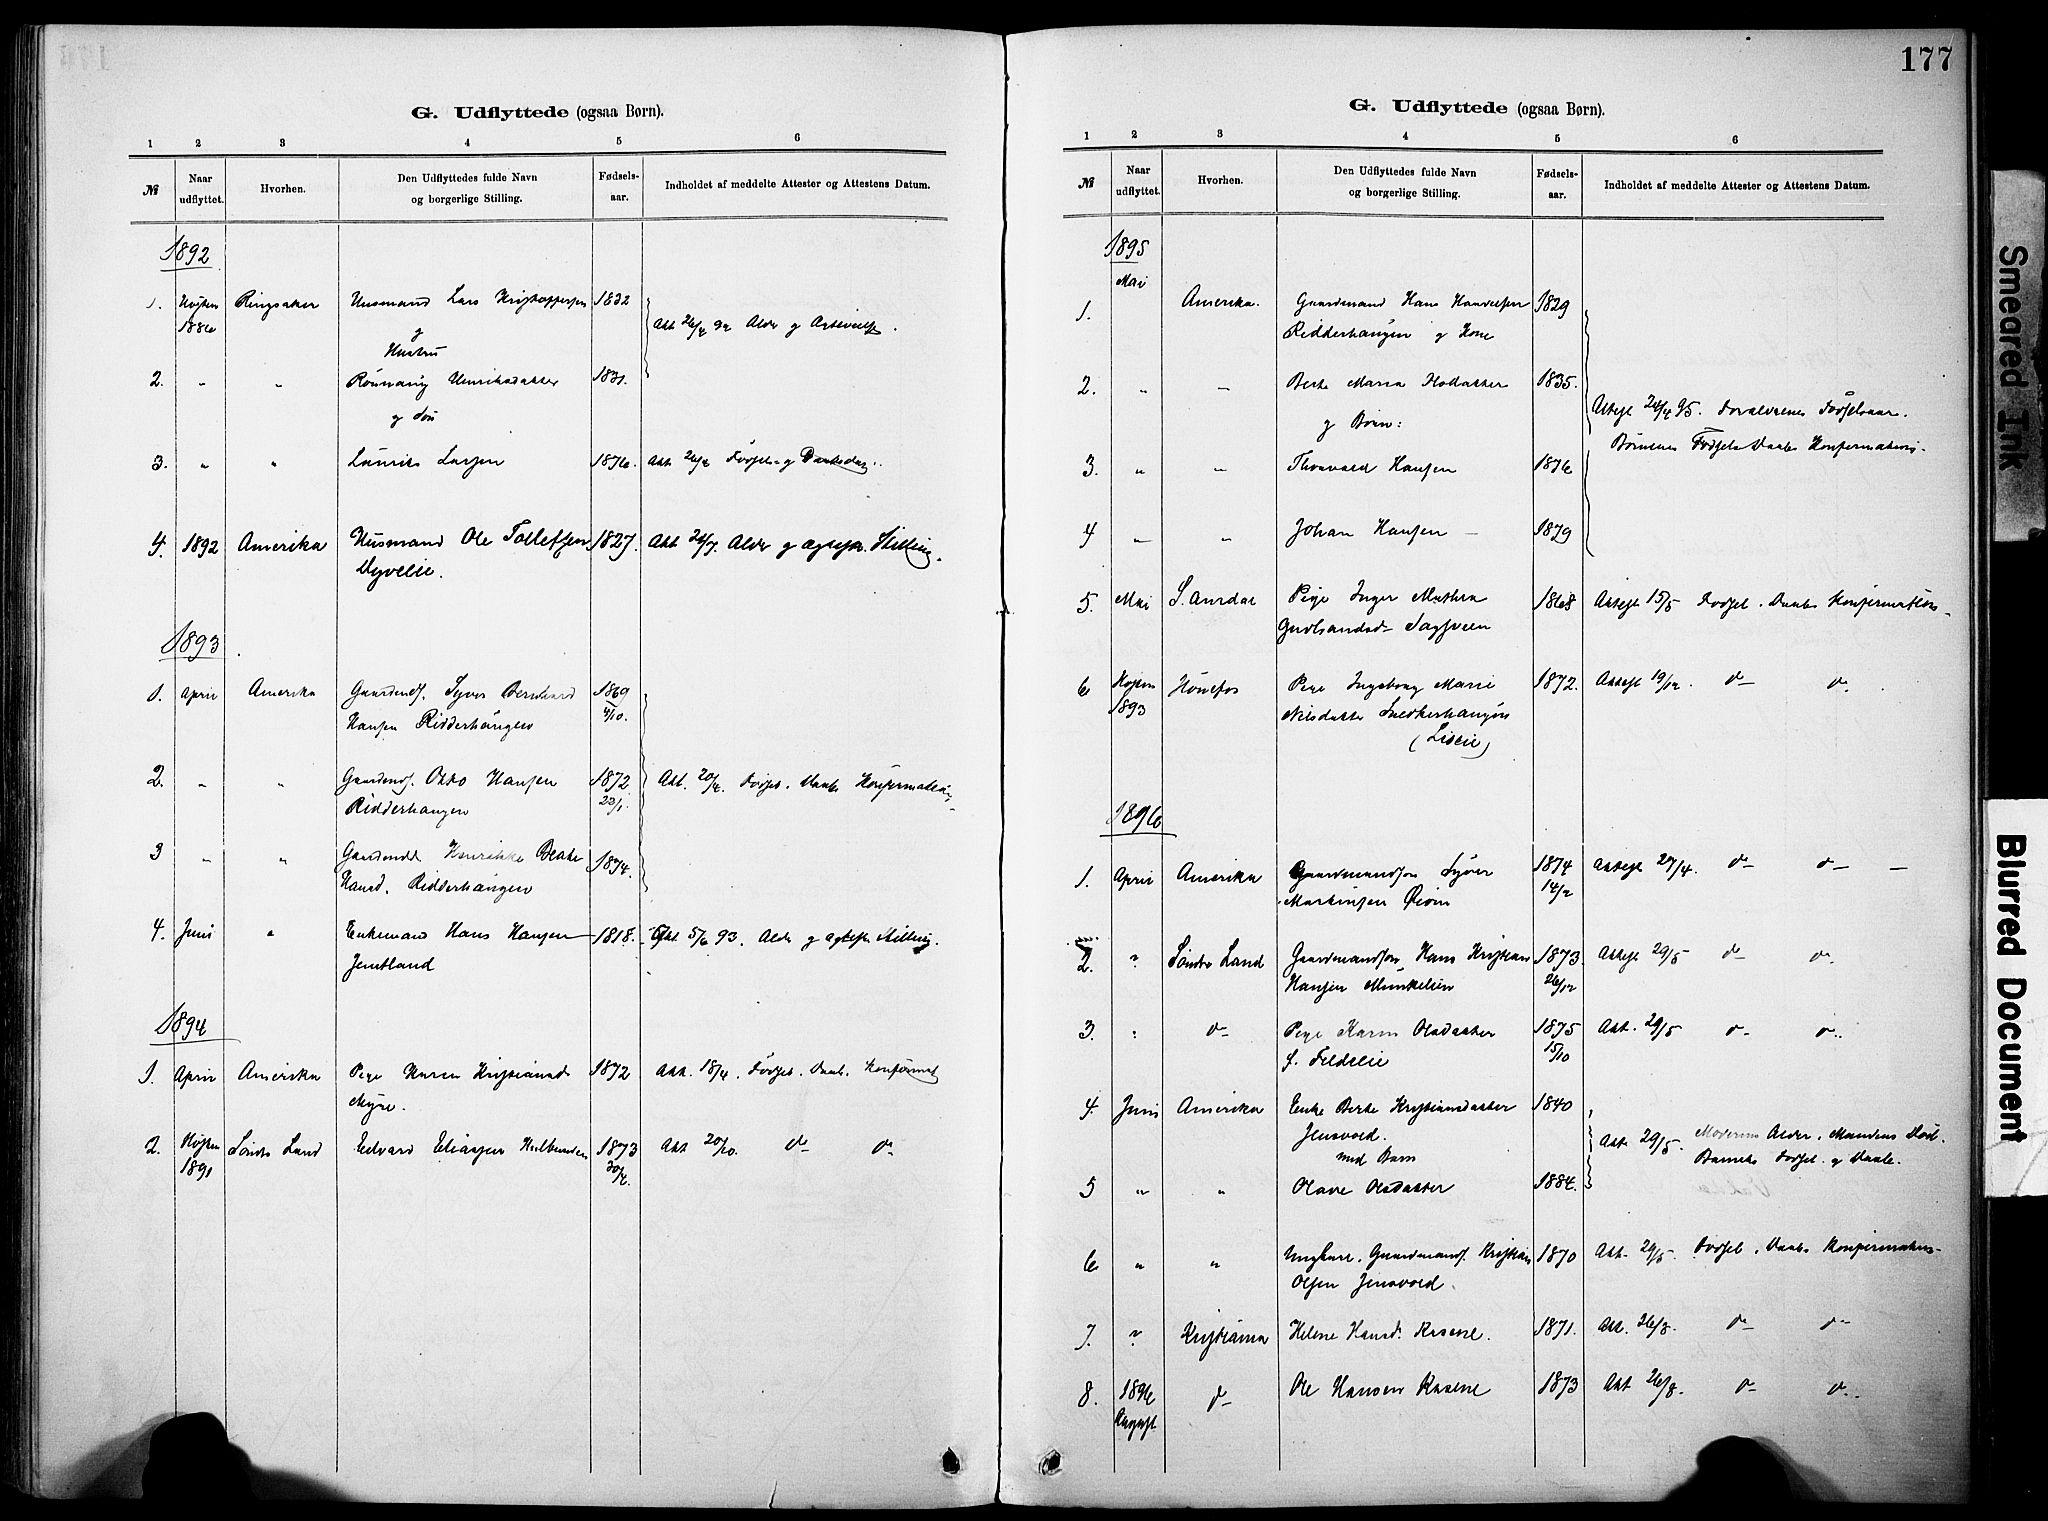 SAH, Nordre Land prestekontor, Ministerialbok nr. 5, 1882-1903, s. 177